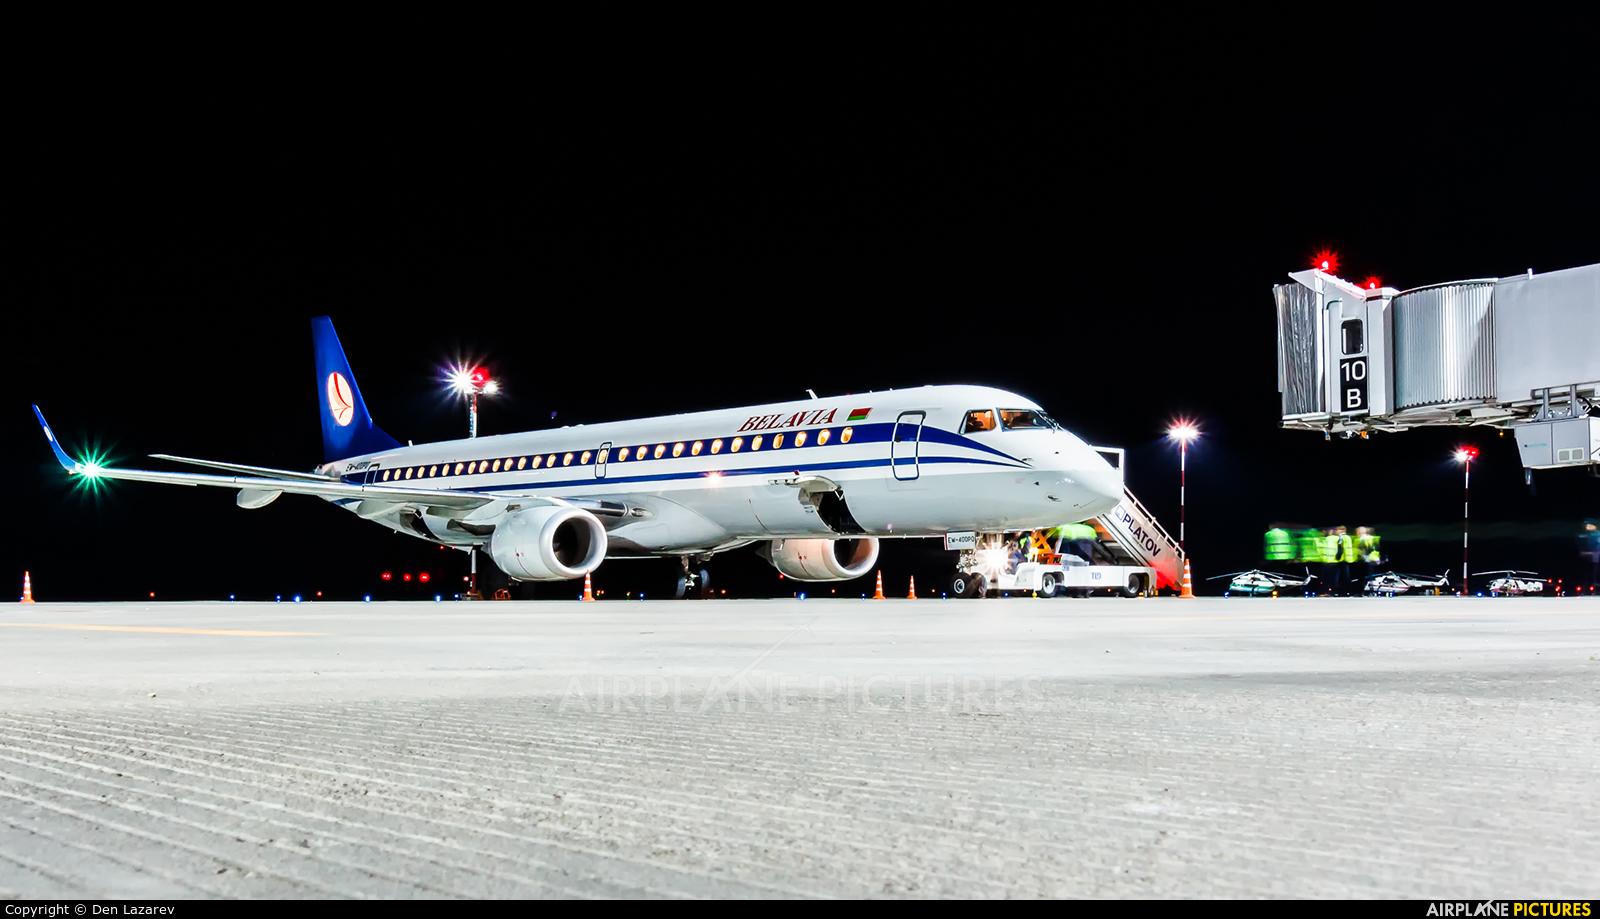 Belavia EW-400PO aircraft at Rostov-on-Don